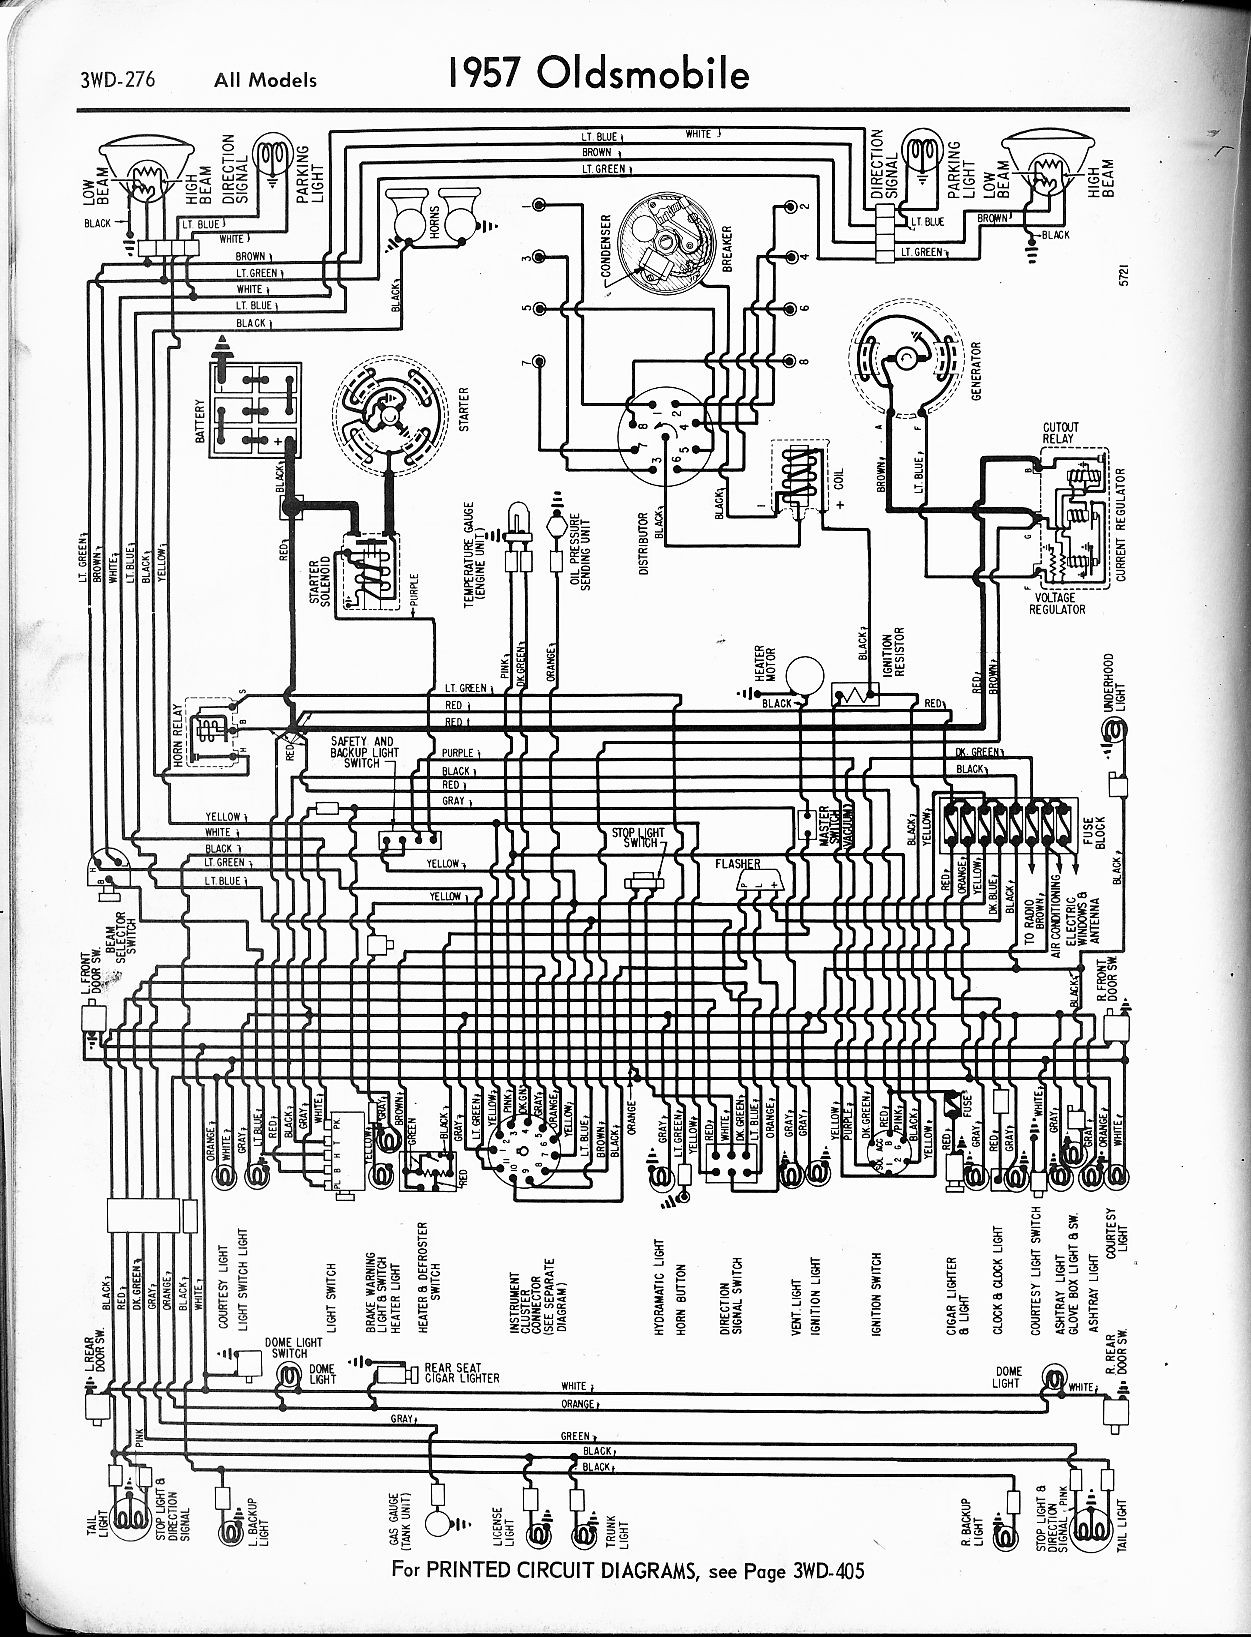 Vw Golf Engine Diagram Wiring Diagram In Addition 57 Chevy Heater Diagram Also 1996 Chevy Of Vw Golf Engine Diagram